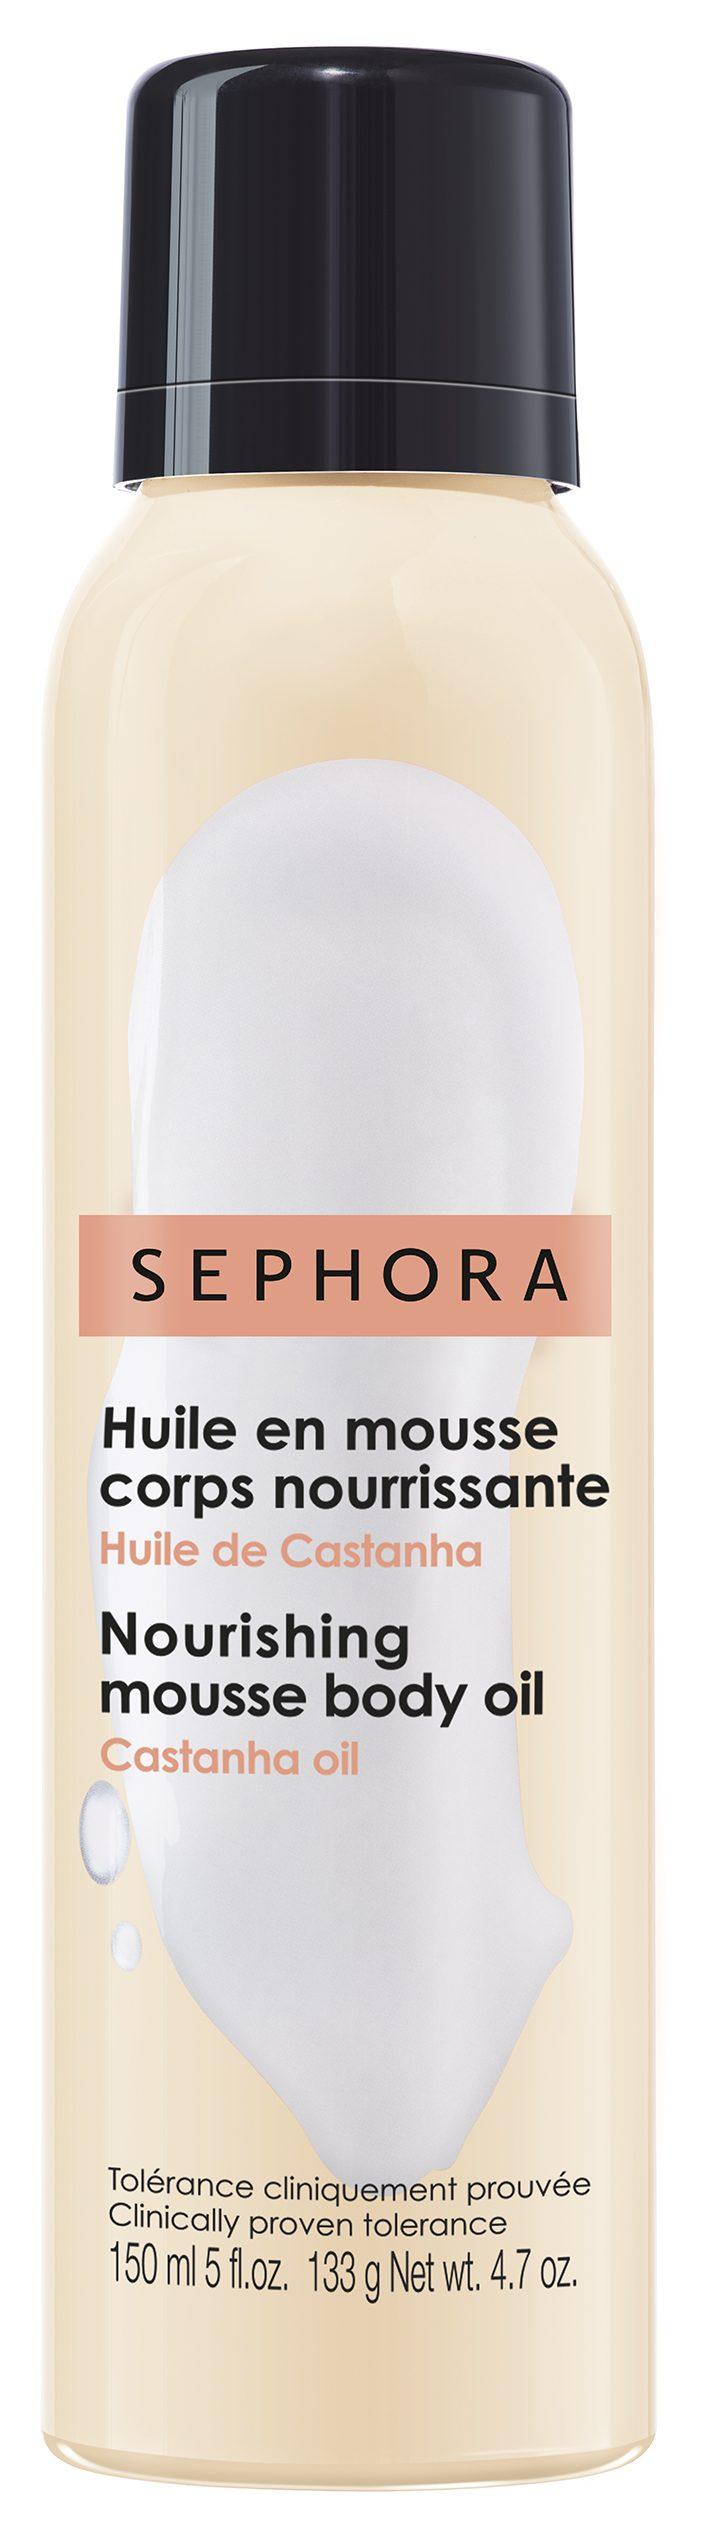 Sephora olie